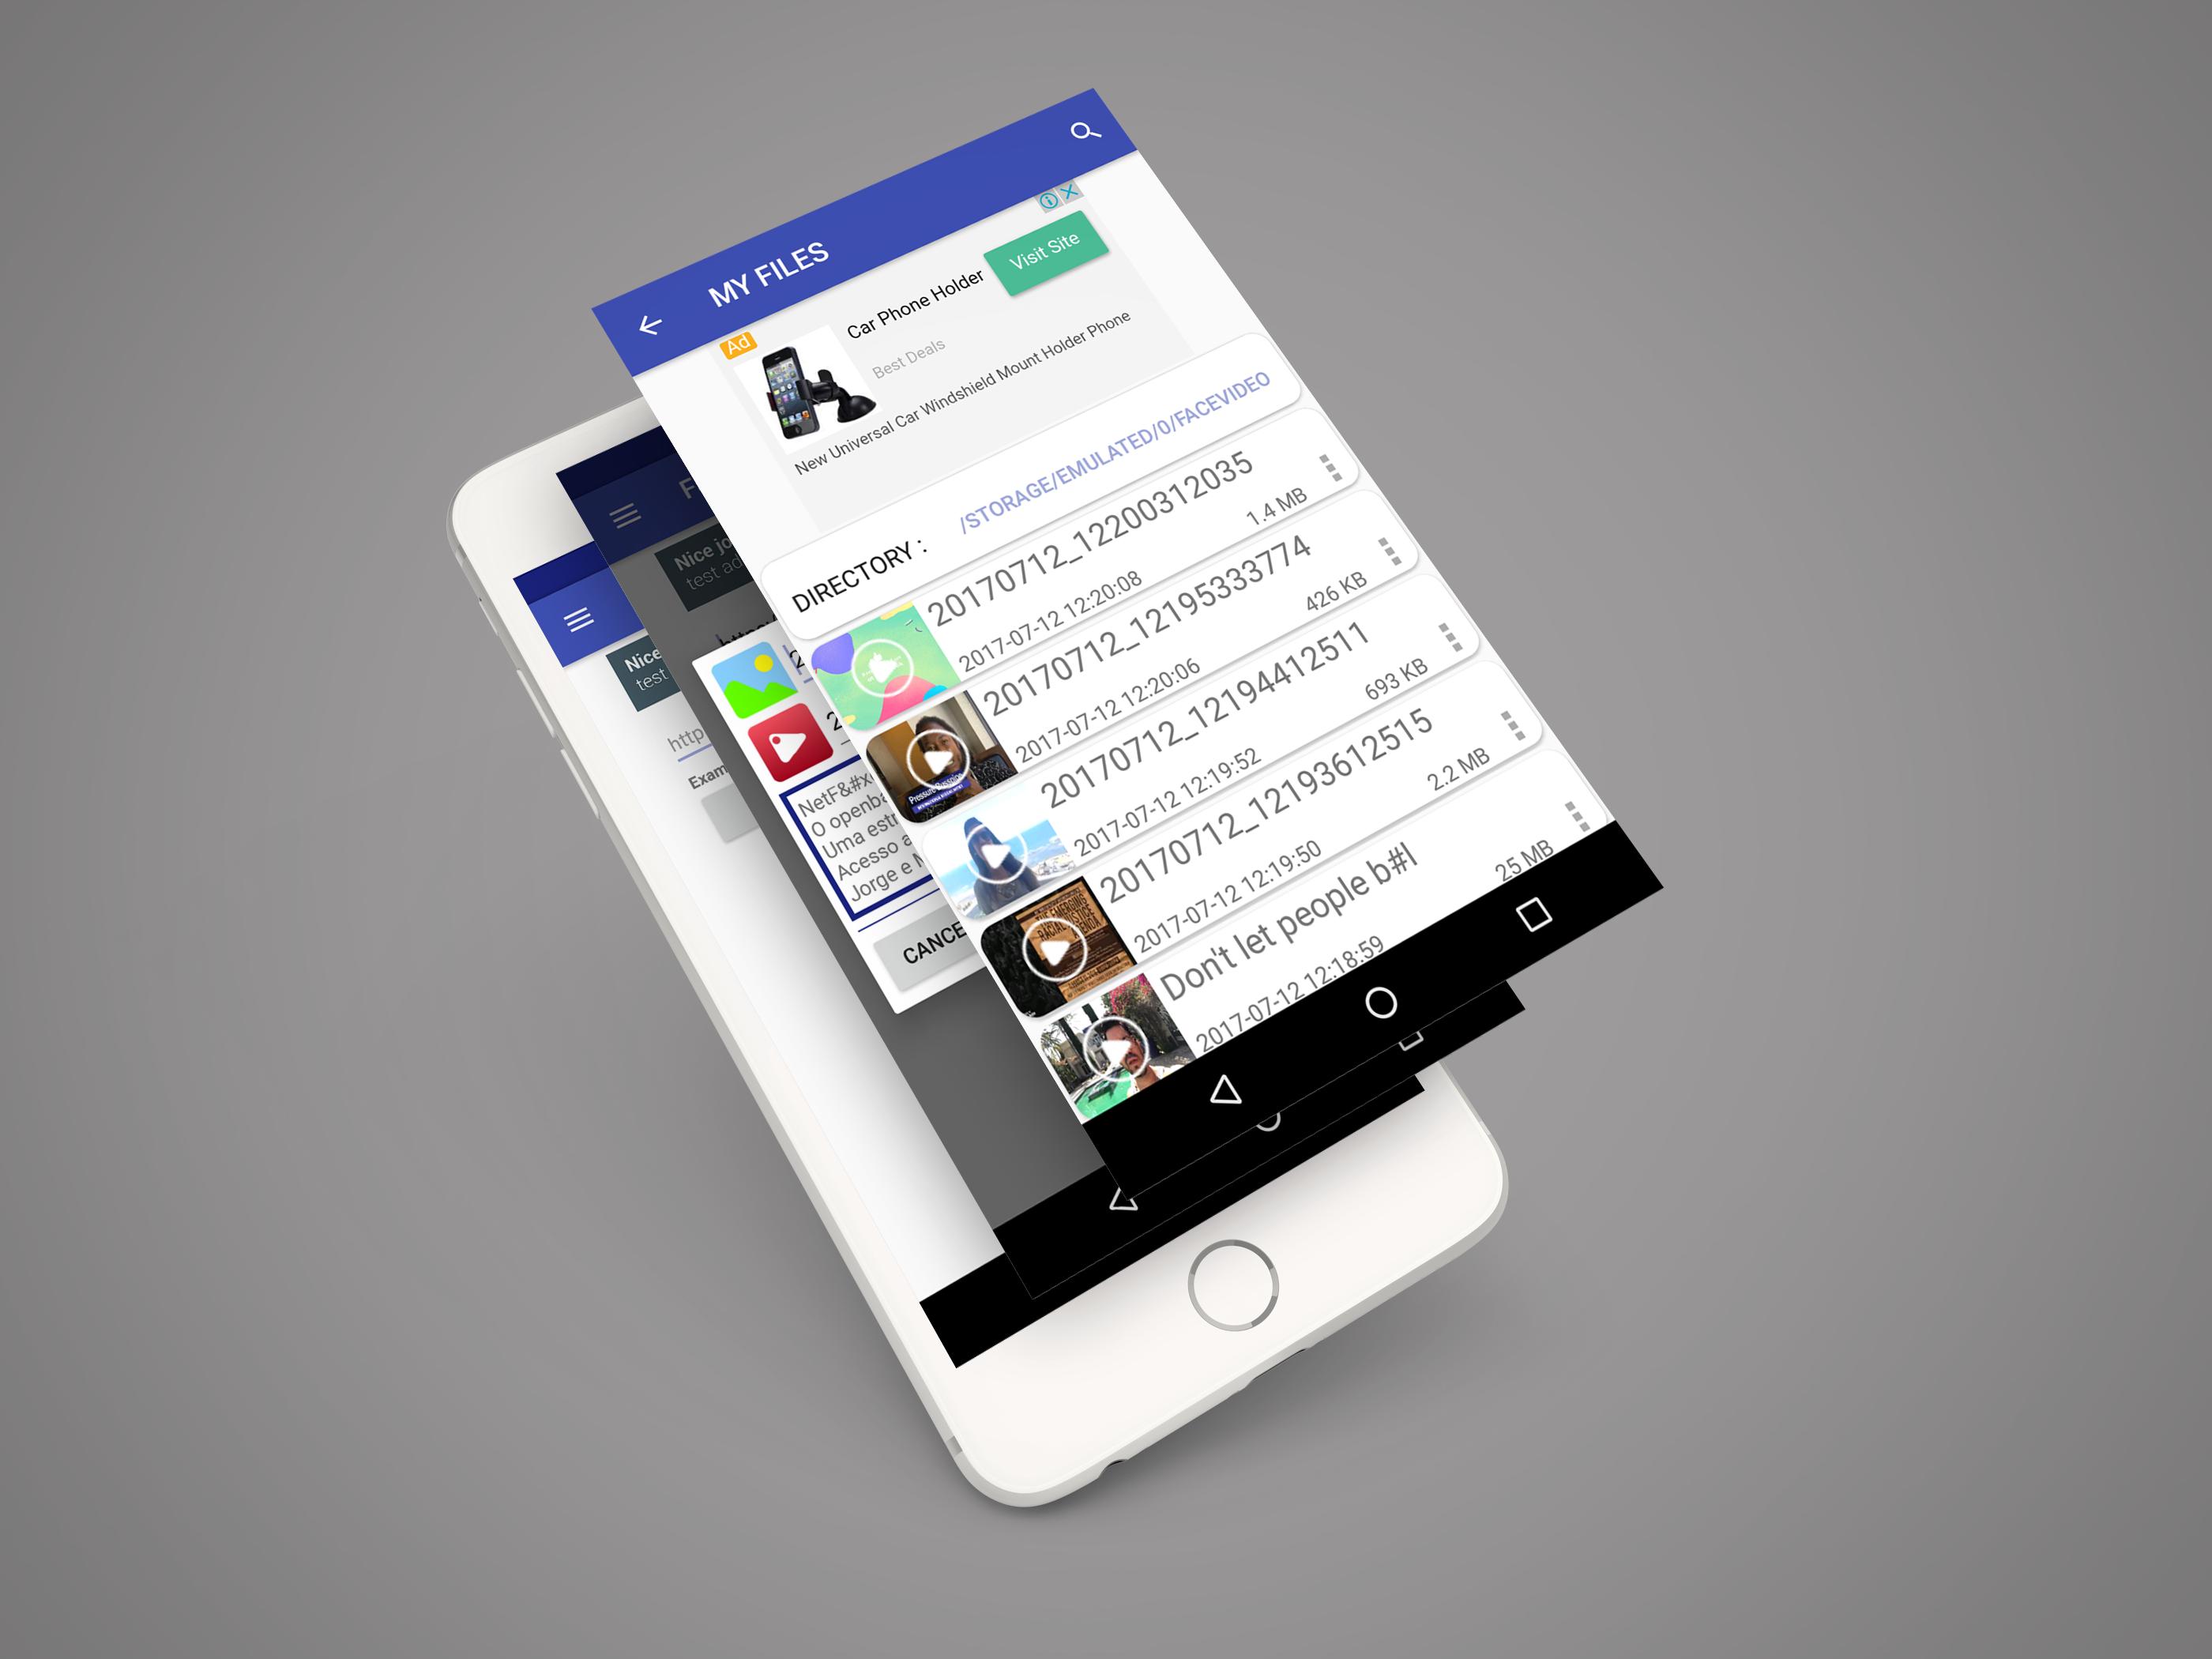 Facebook Downloader Video & Photo & Gif - 1